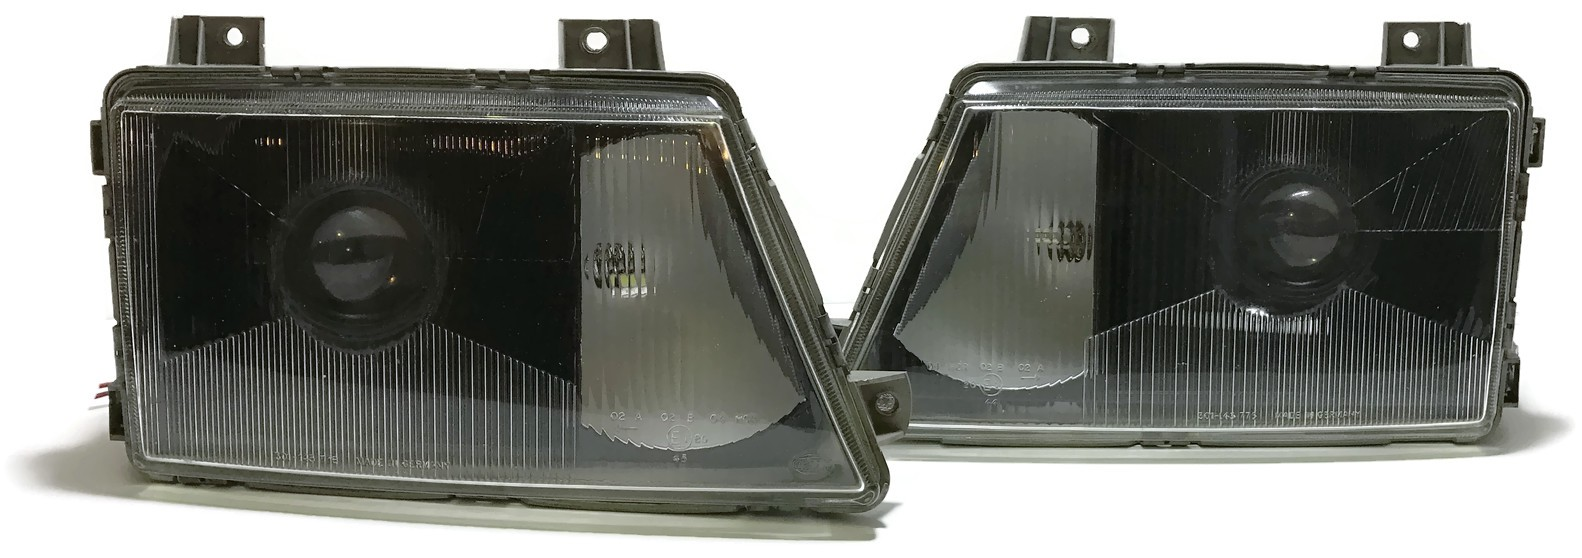 LAMPY BI XENON MERCEDES SPRINTER W901 312 SOCZEWKI